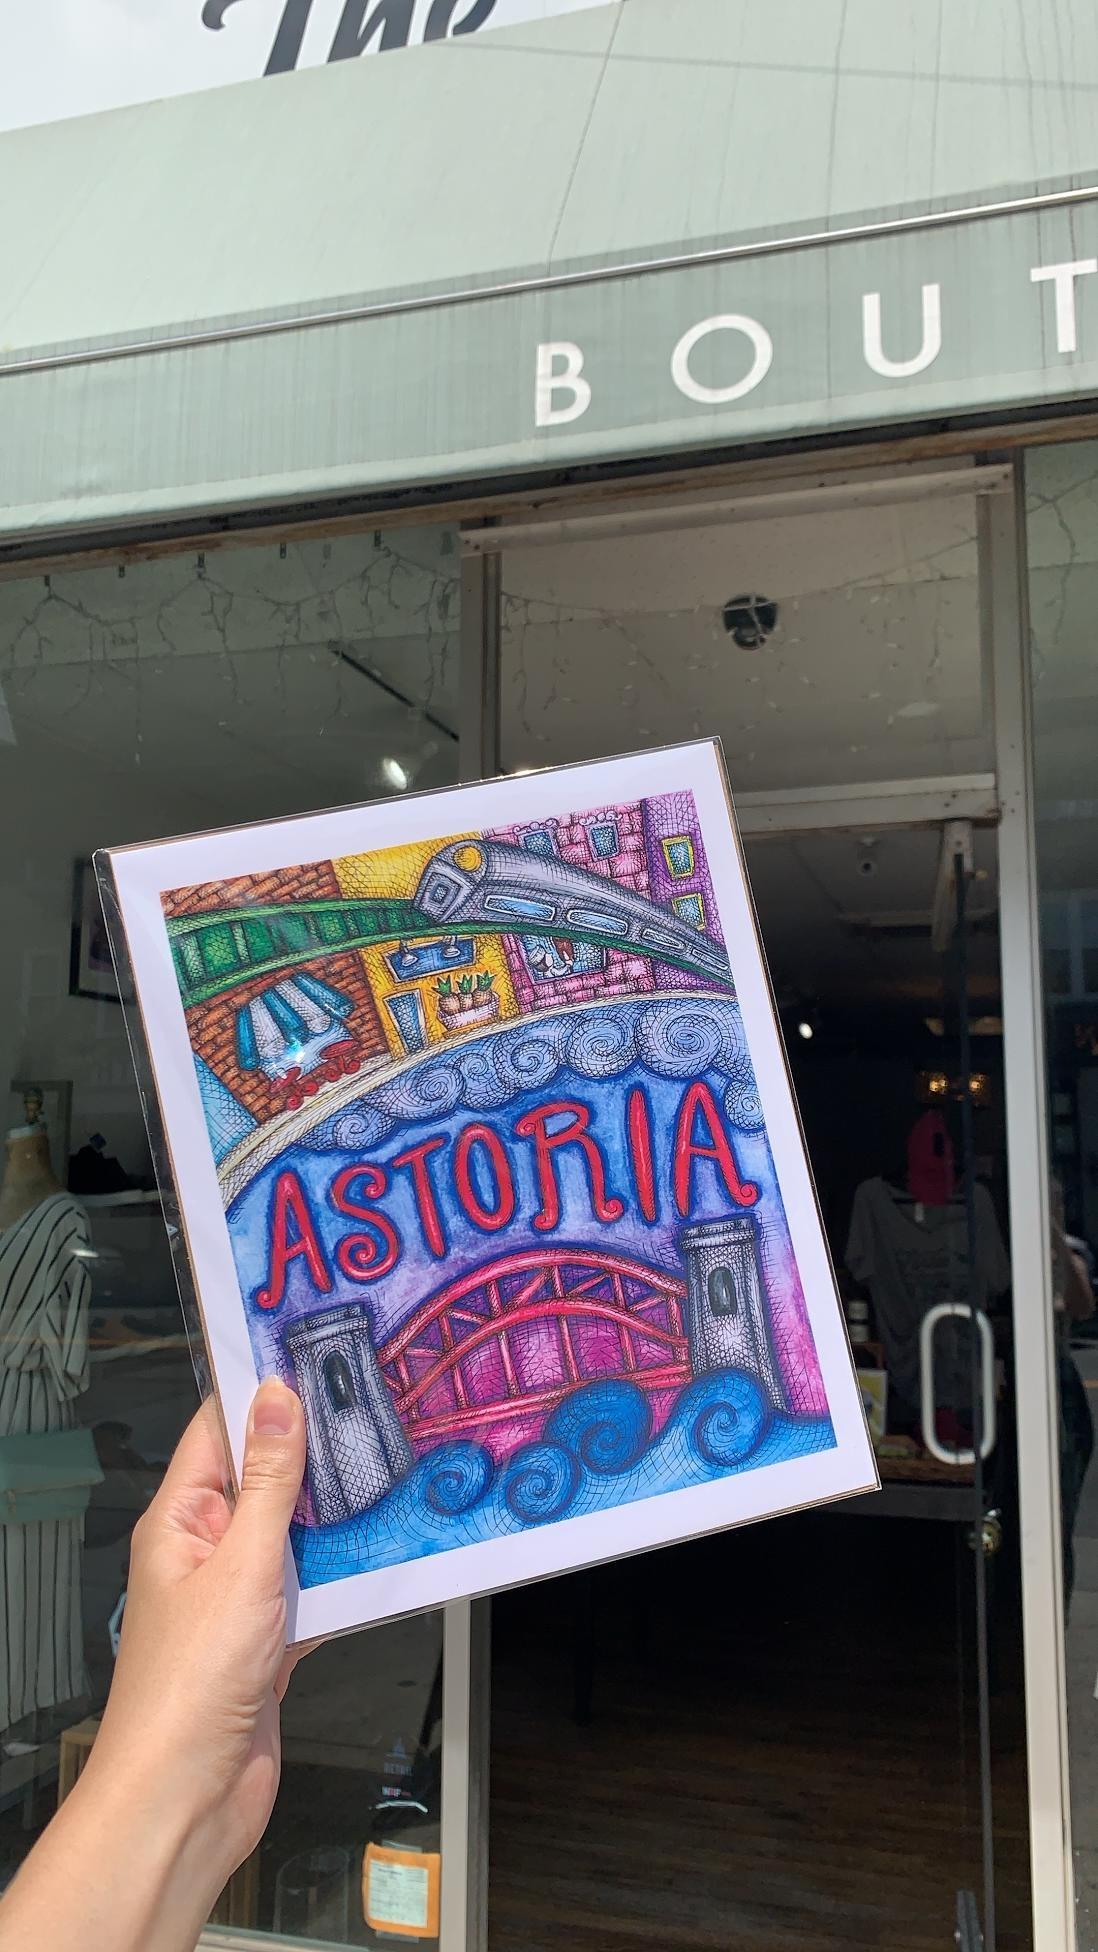 About a Cloud Astoria Print